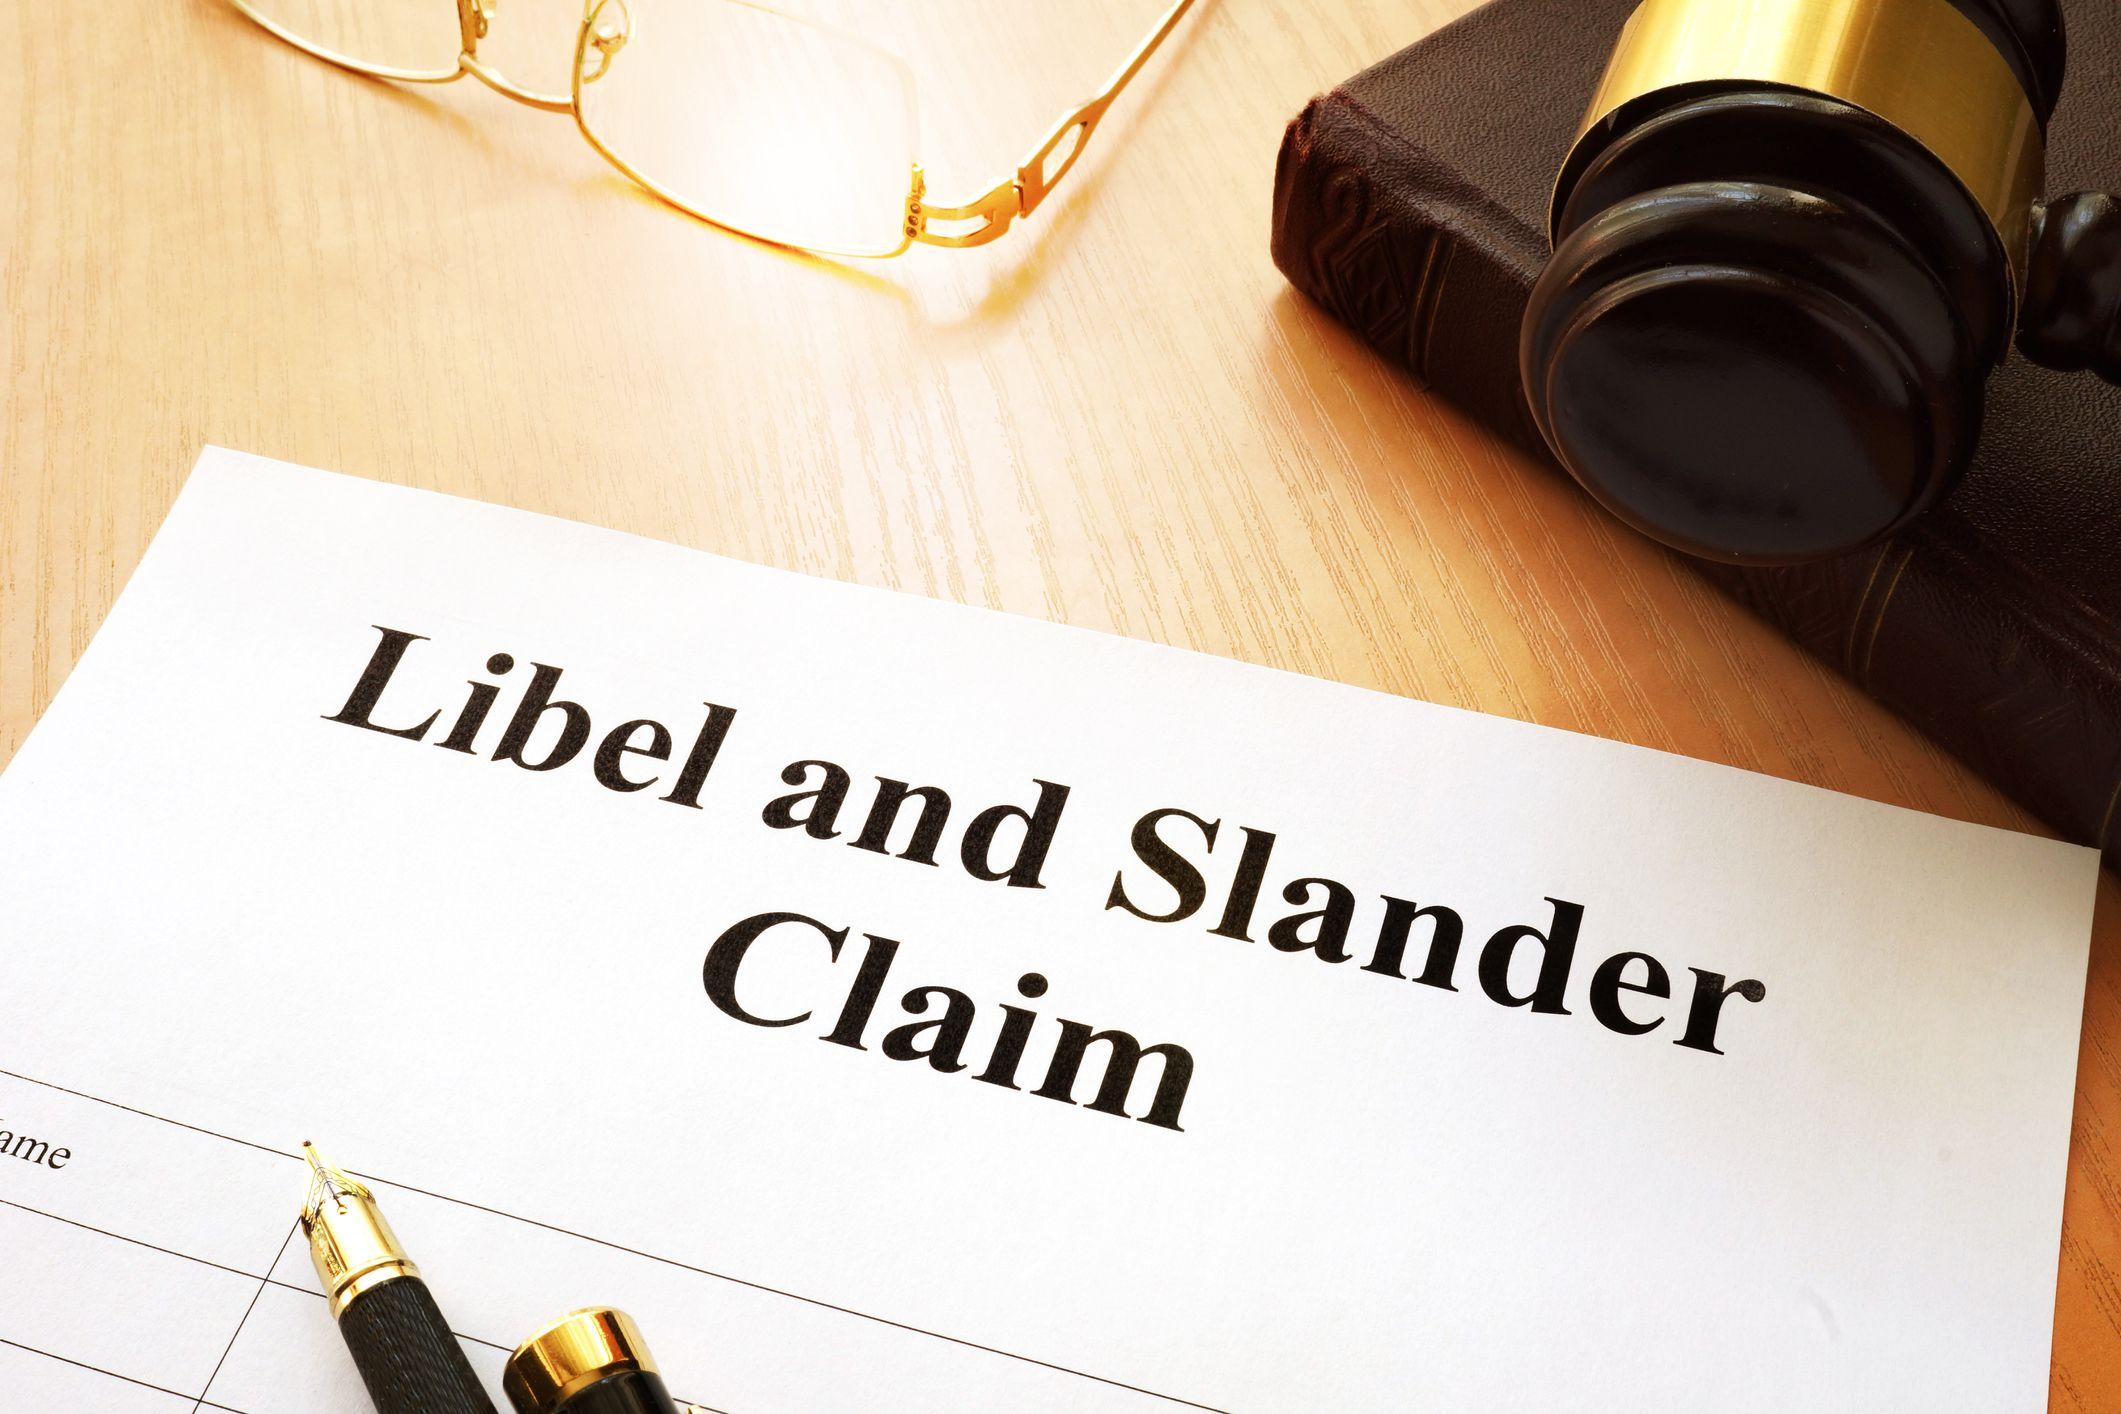 libel vs slander vs defamation singapore law